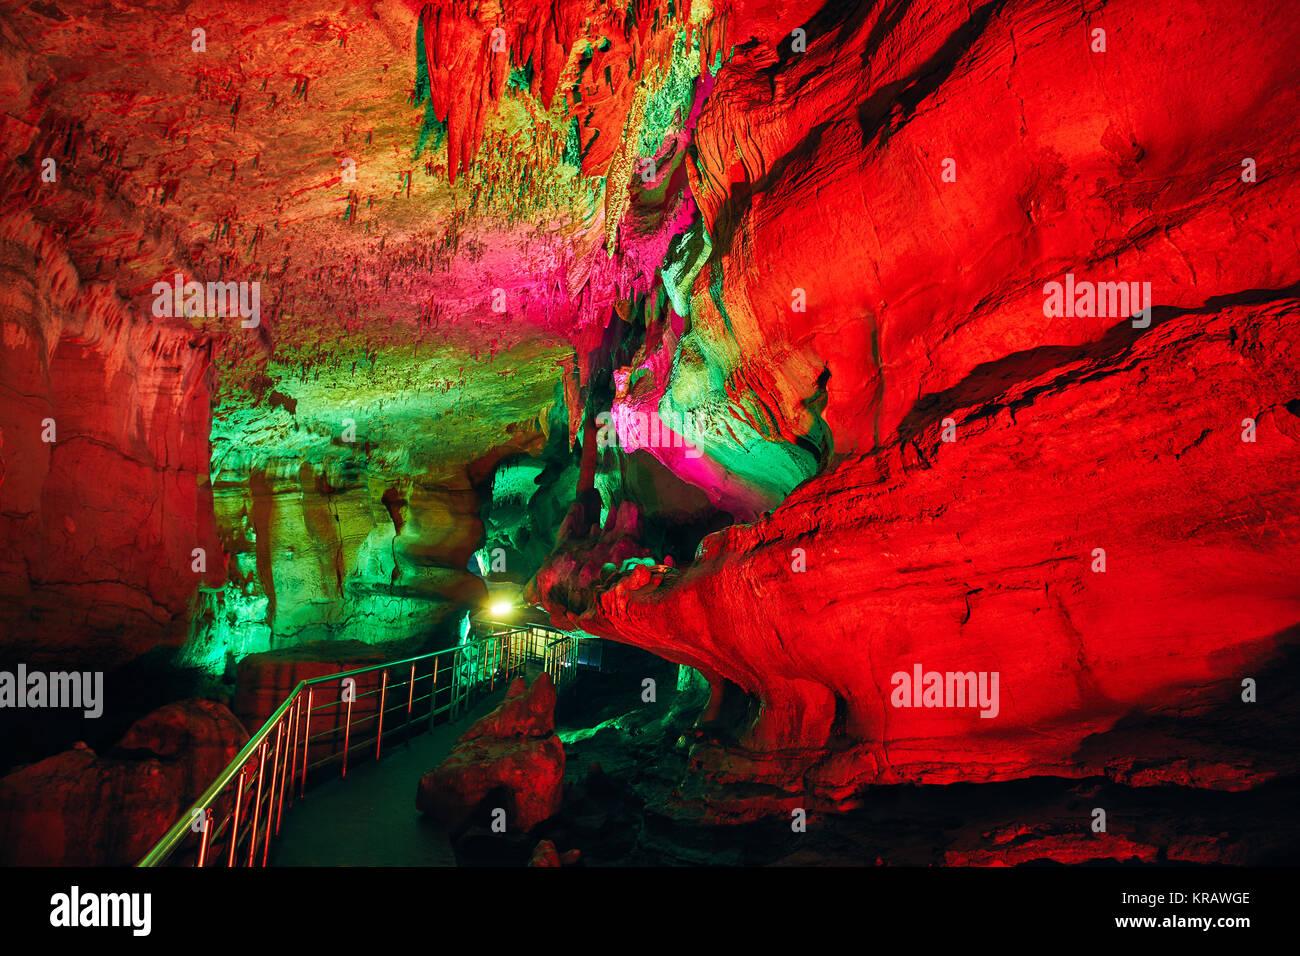 Underground cave Sataplia with colorful red illumination in Kutaisi, Georgia - Stock Image